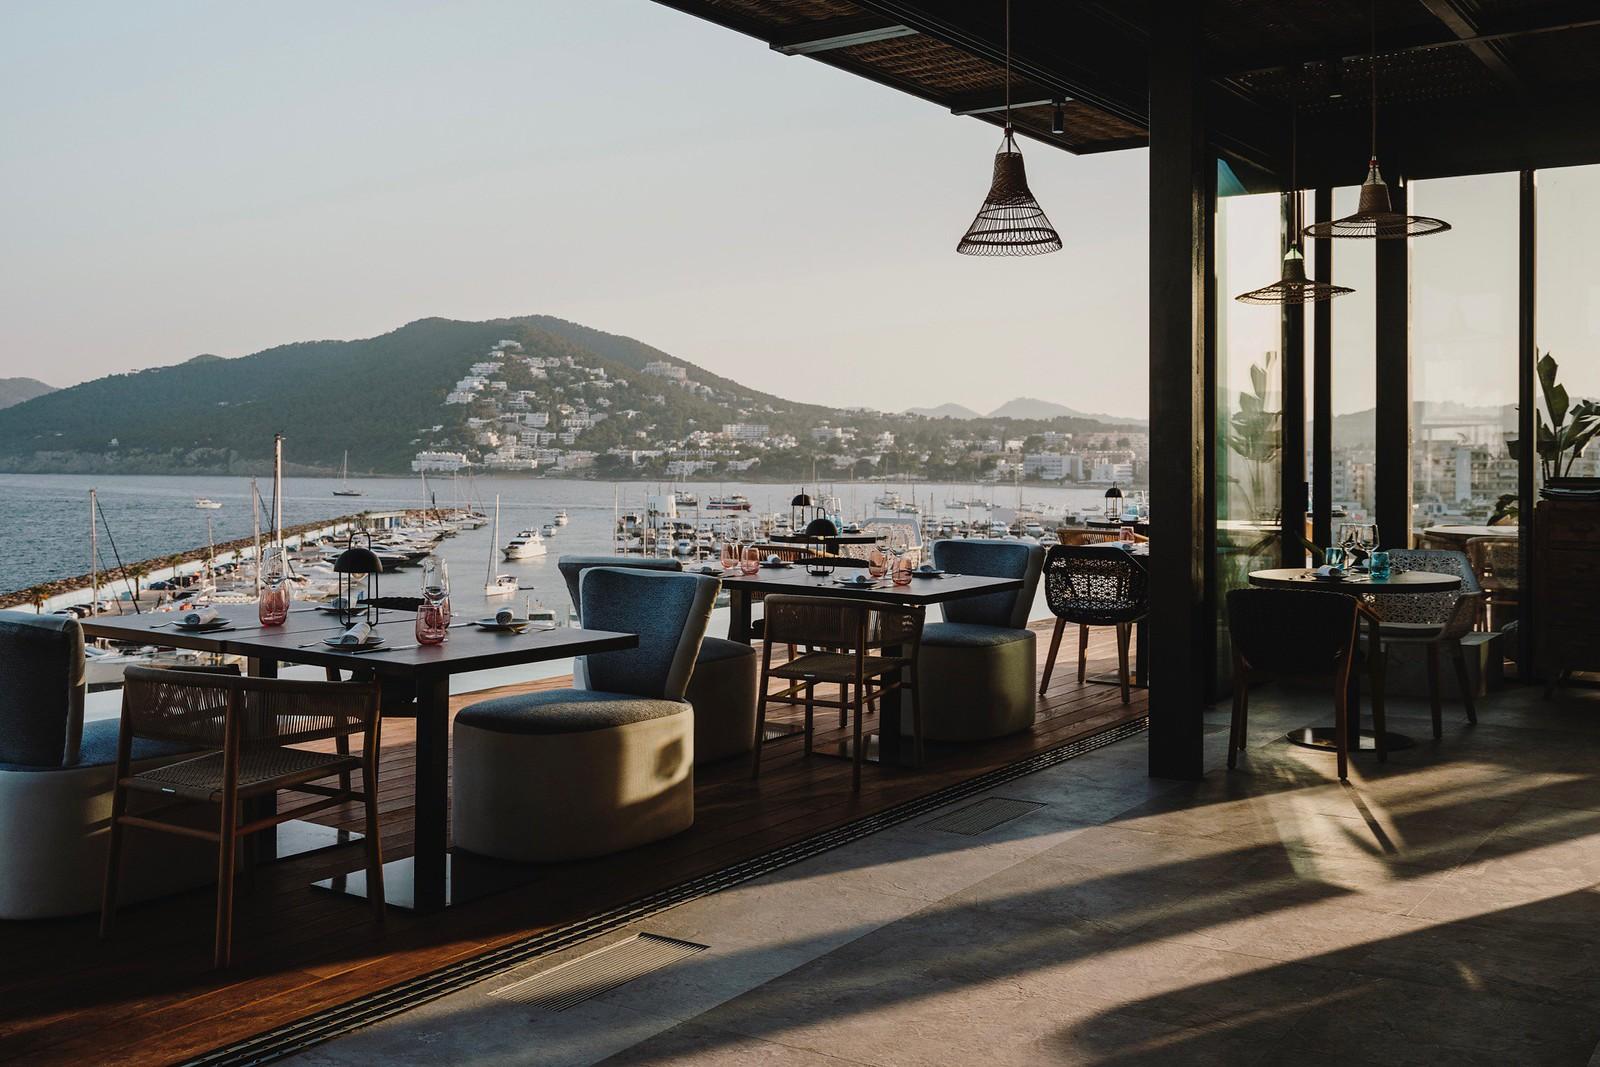 https://www.white-ibiza.com/wp-content/uploads/2020/02/ibiza-restaurants-maymanta-2019-01.jpg